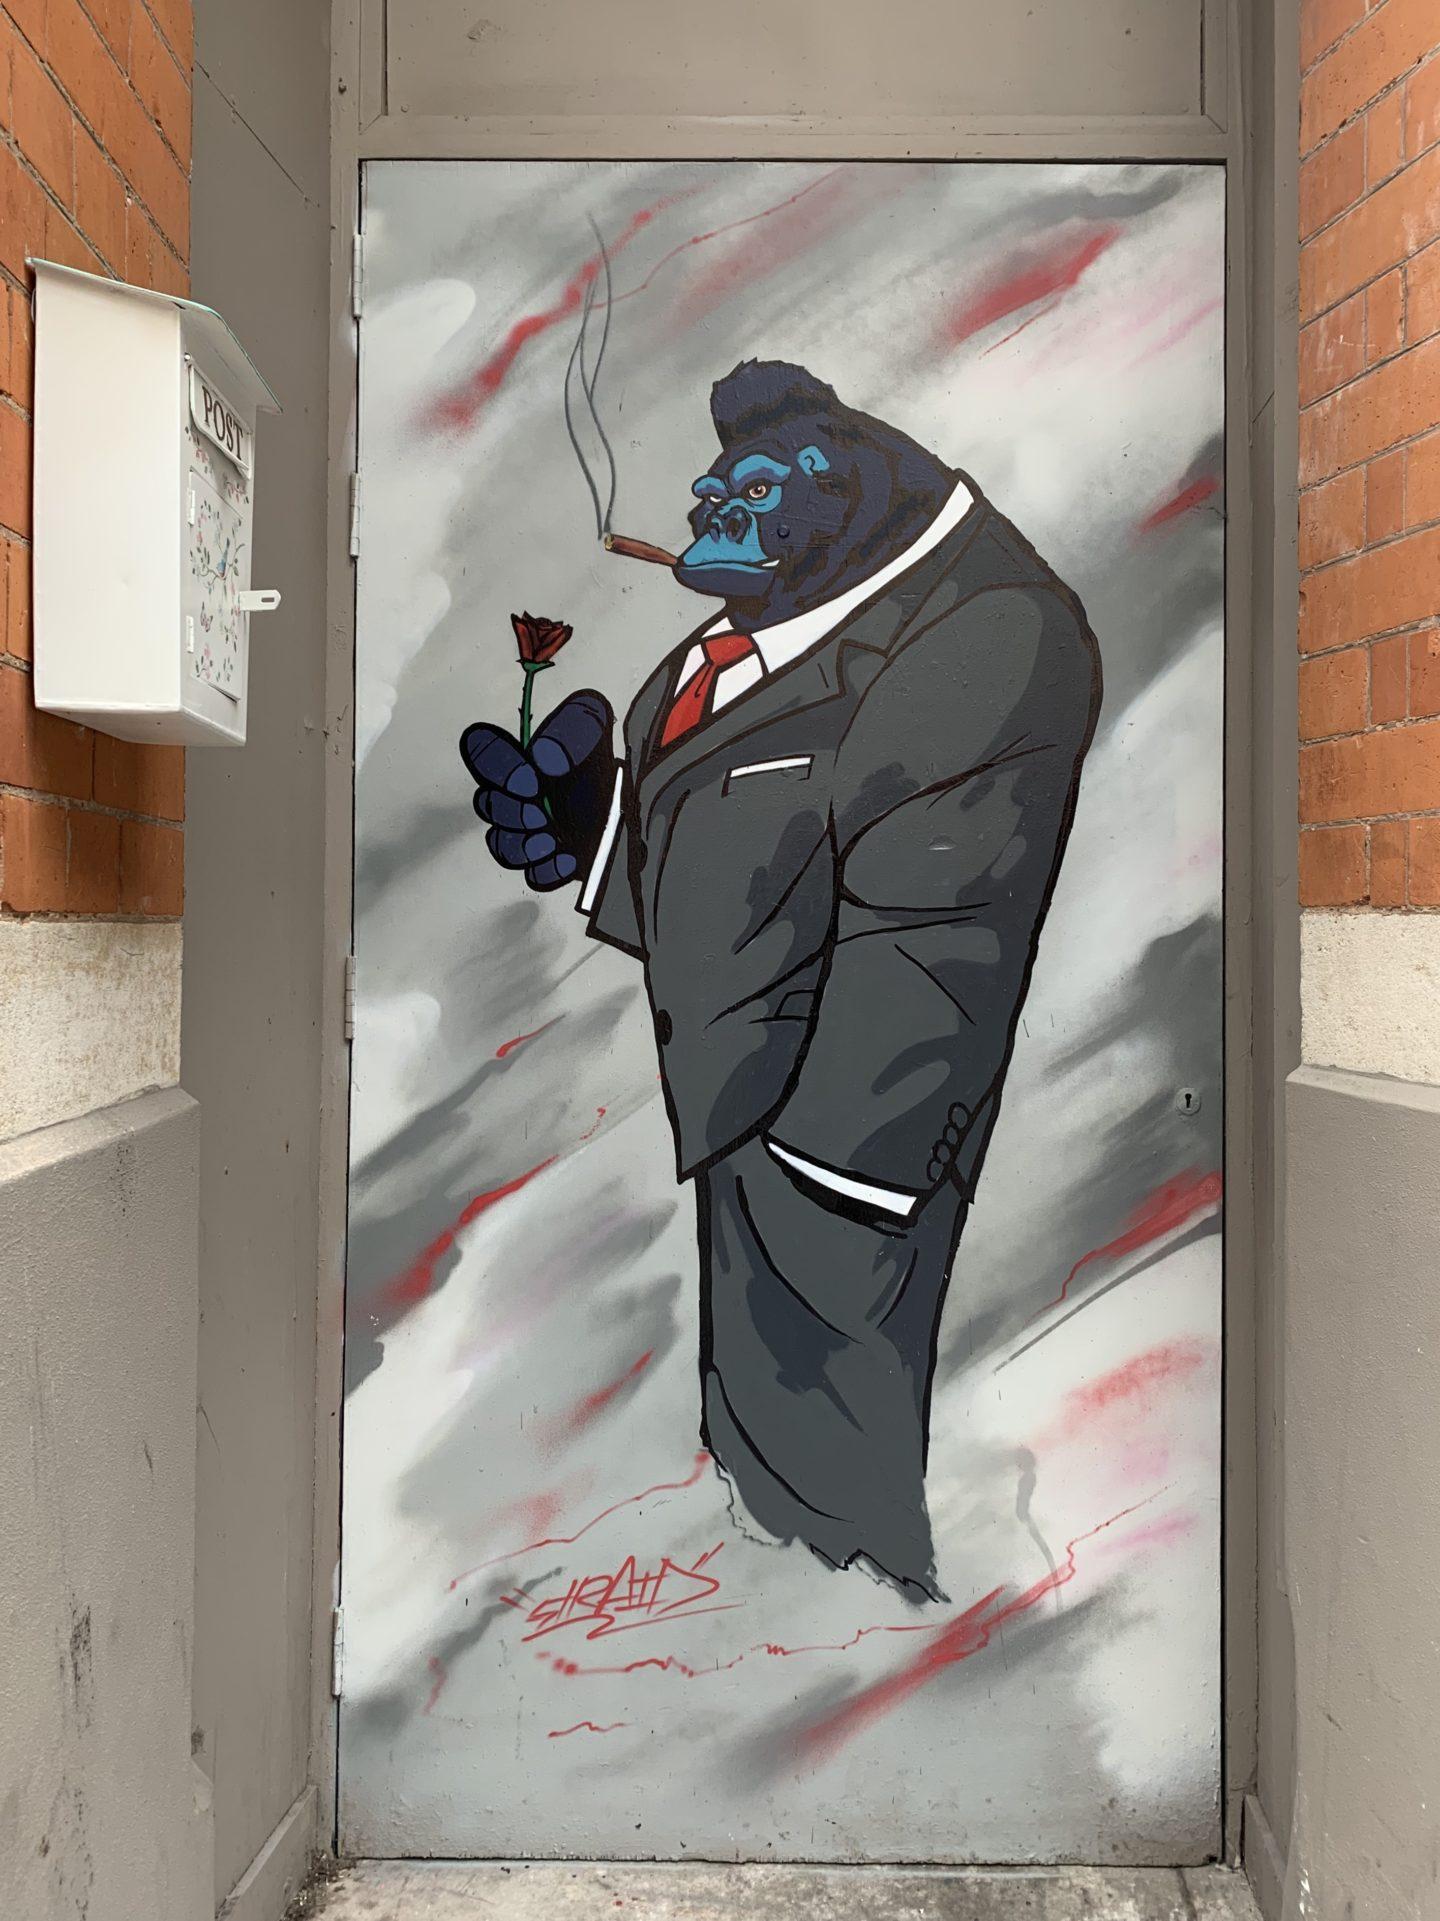 The urban street art scene transforming Leicester